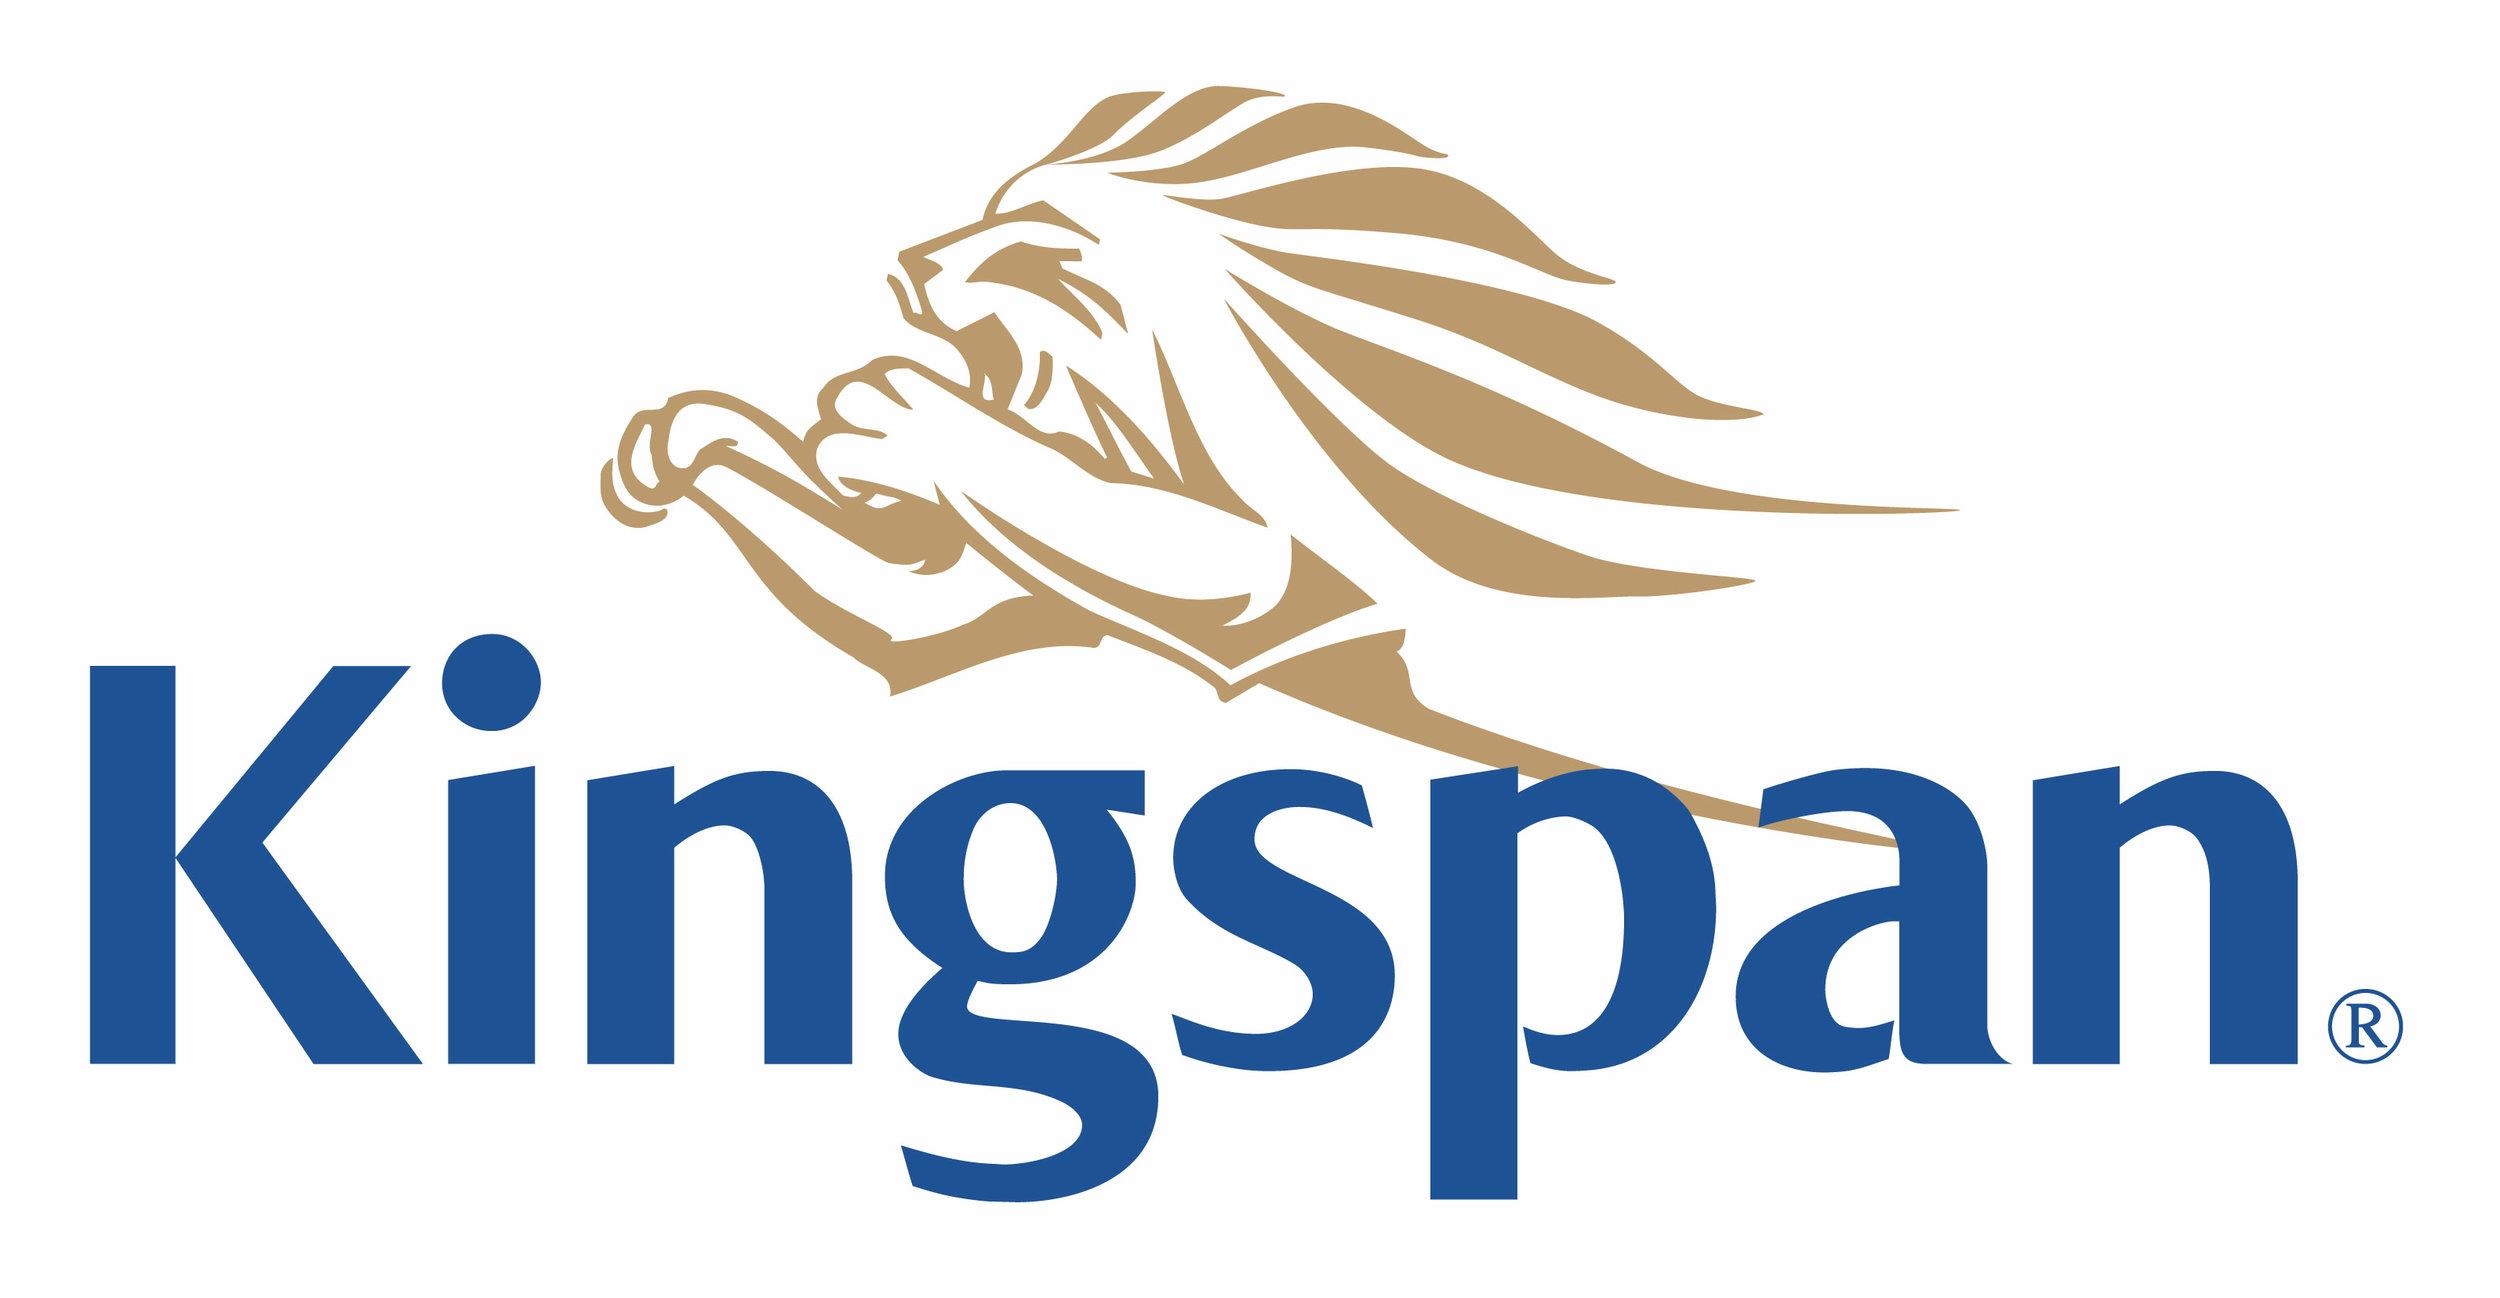 KINGSPAN LOGO FOR CONVENTION 2017.jpg